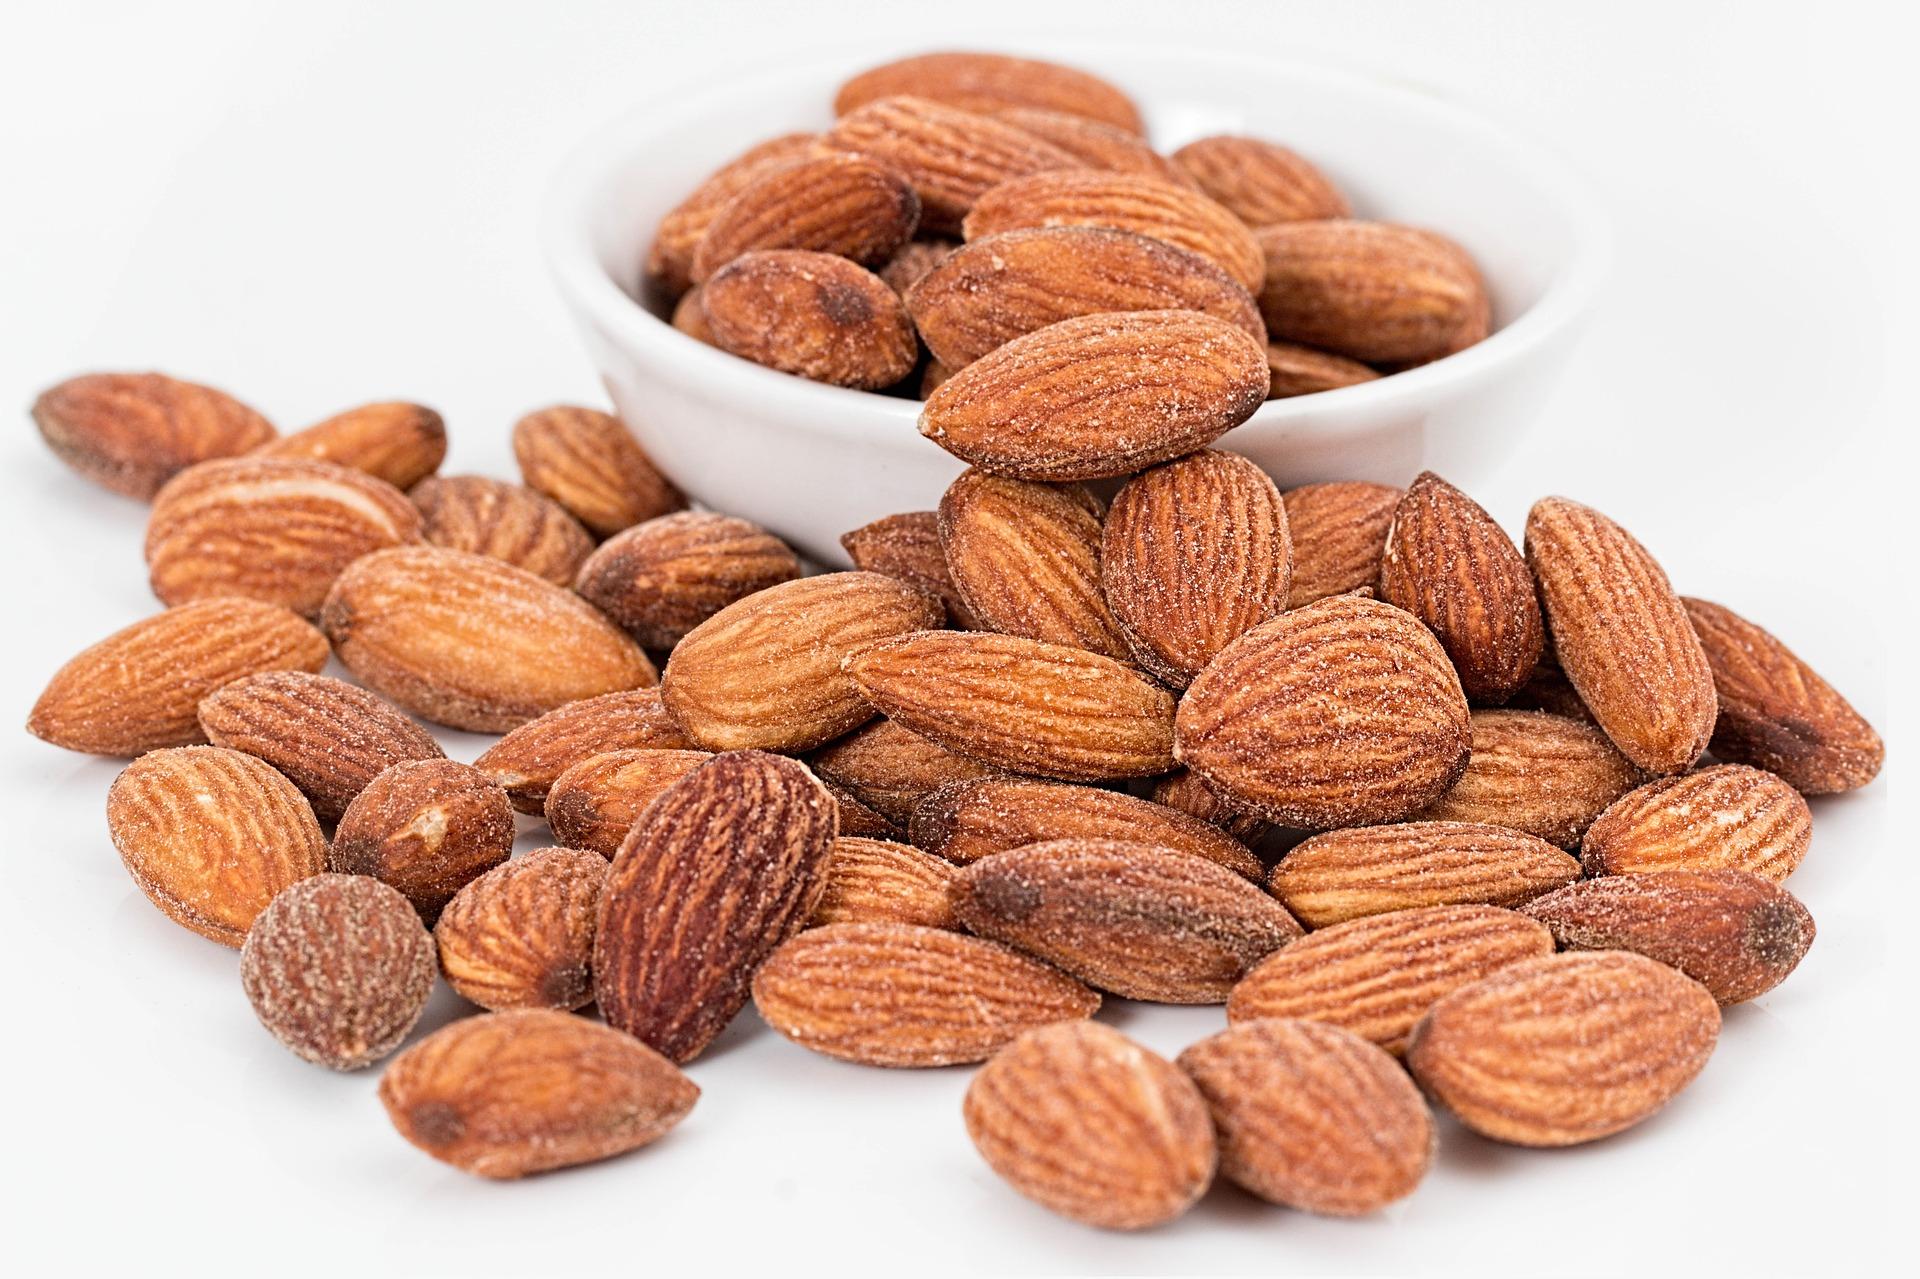 Foods That Help You Sleep - Almonds